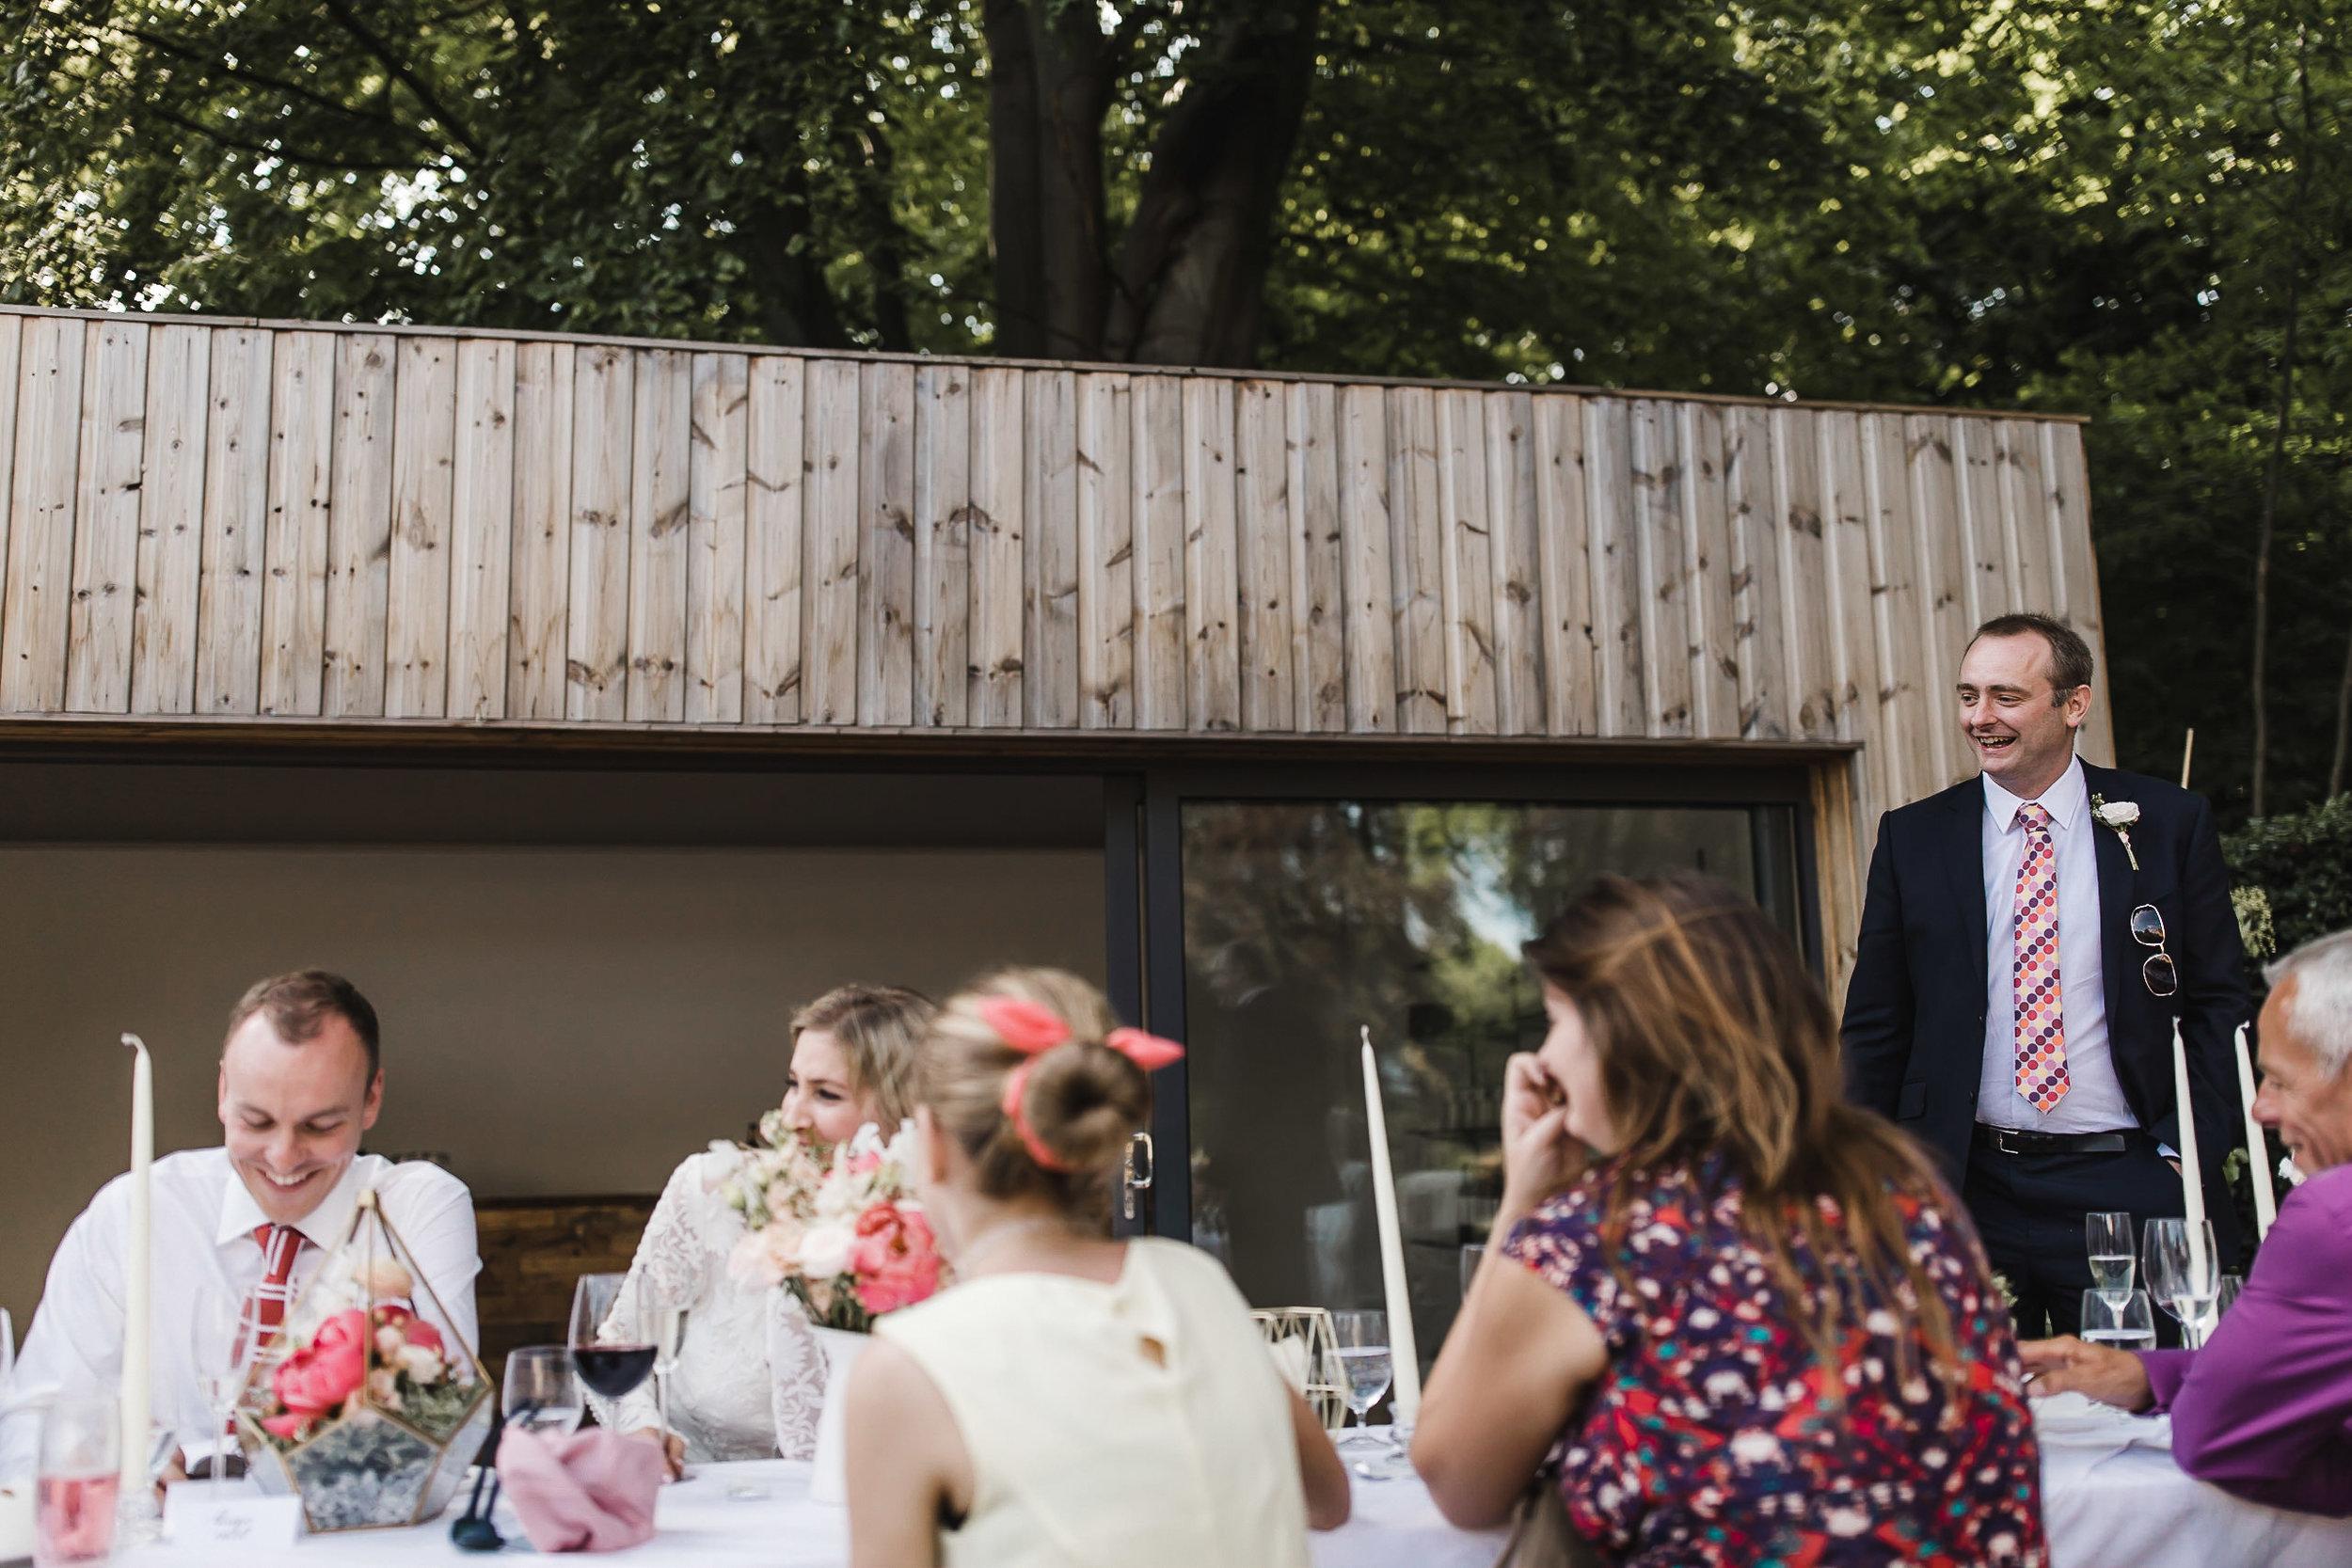 Roundhay-Leeds-Backyard-Wedding-Becs-Chris-171.jpg